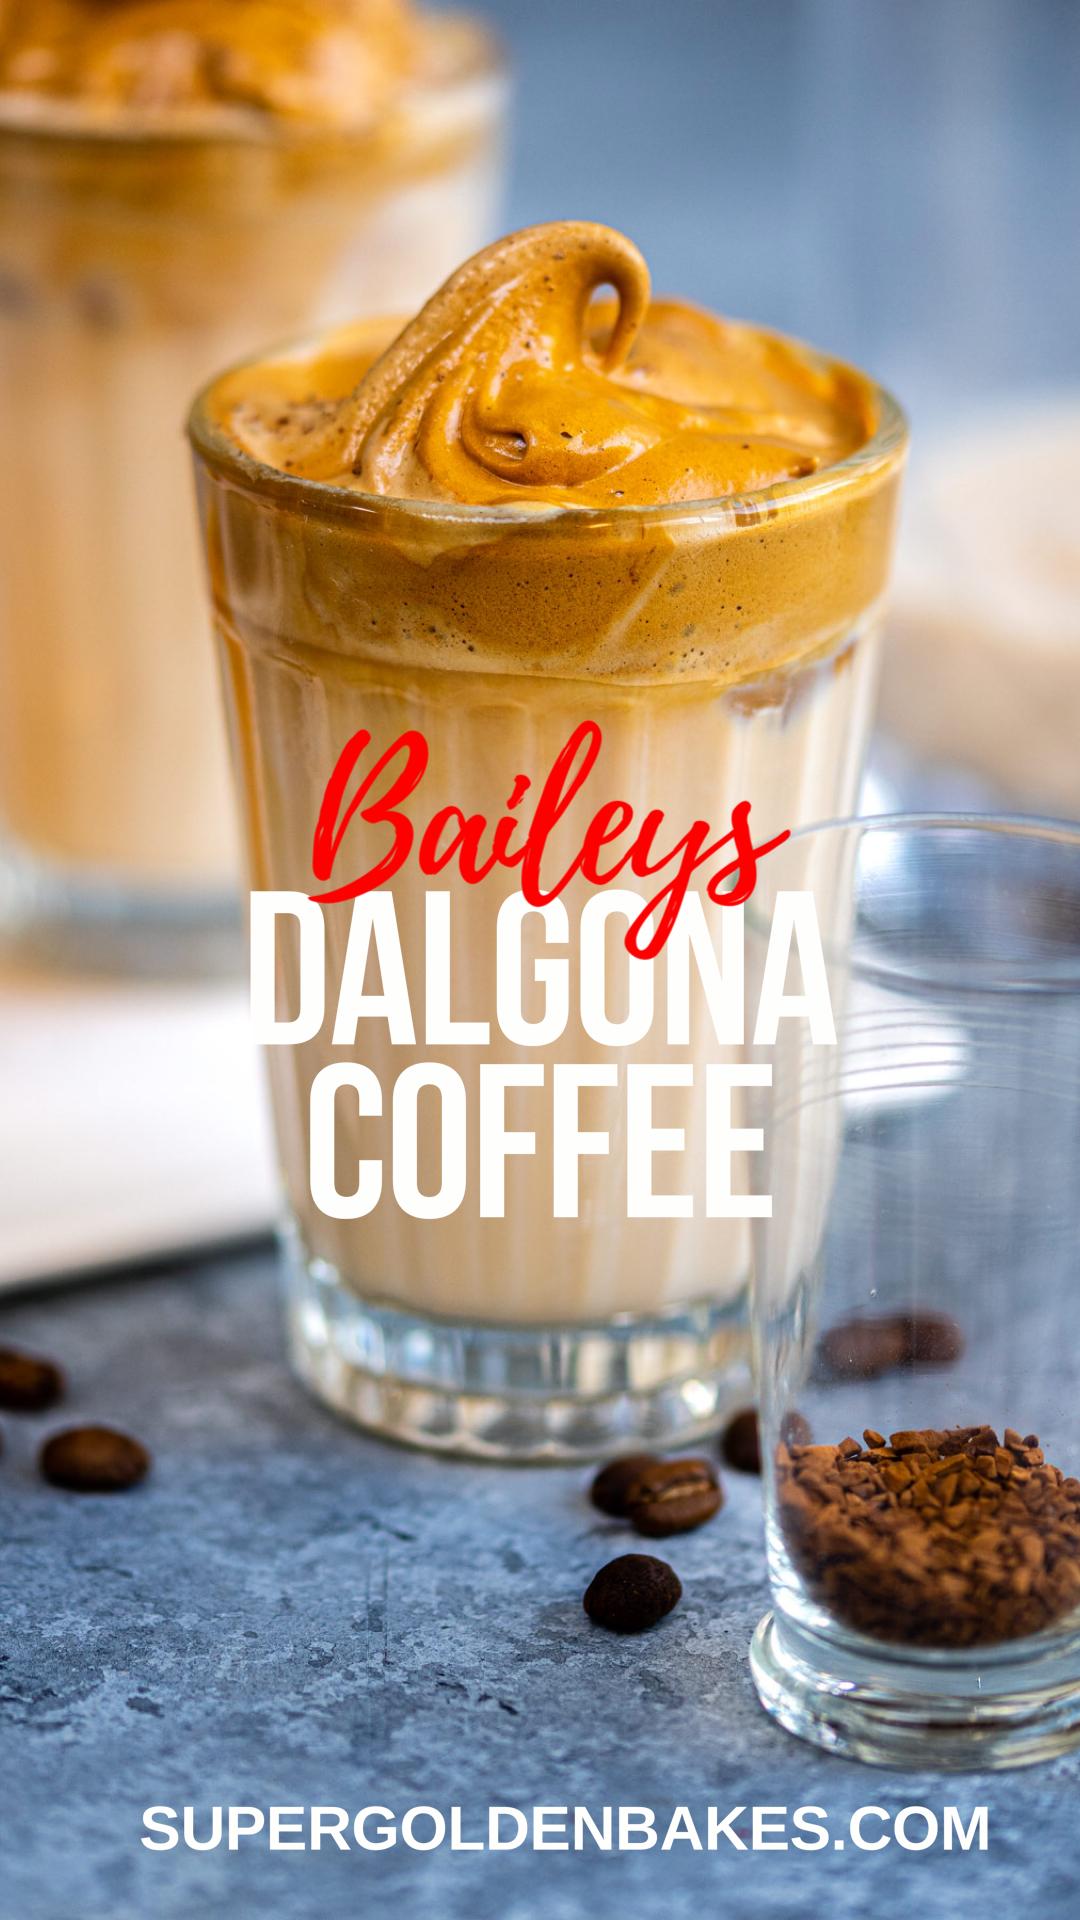 Baileys Whipped Coffee (Dalgona Coffee) in 2020 Ice